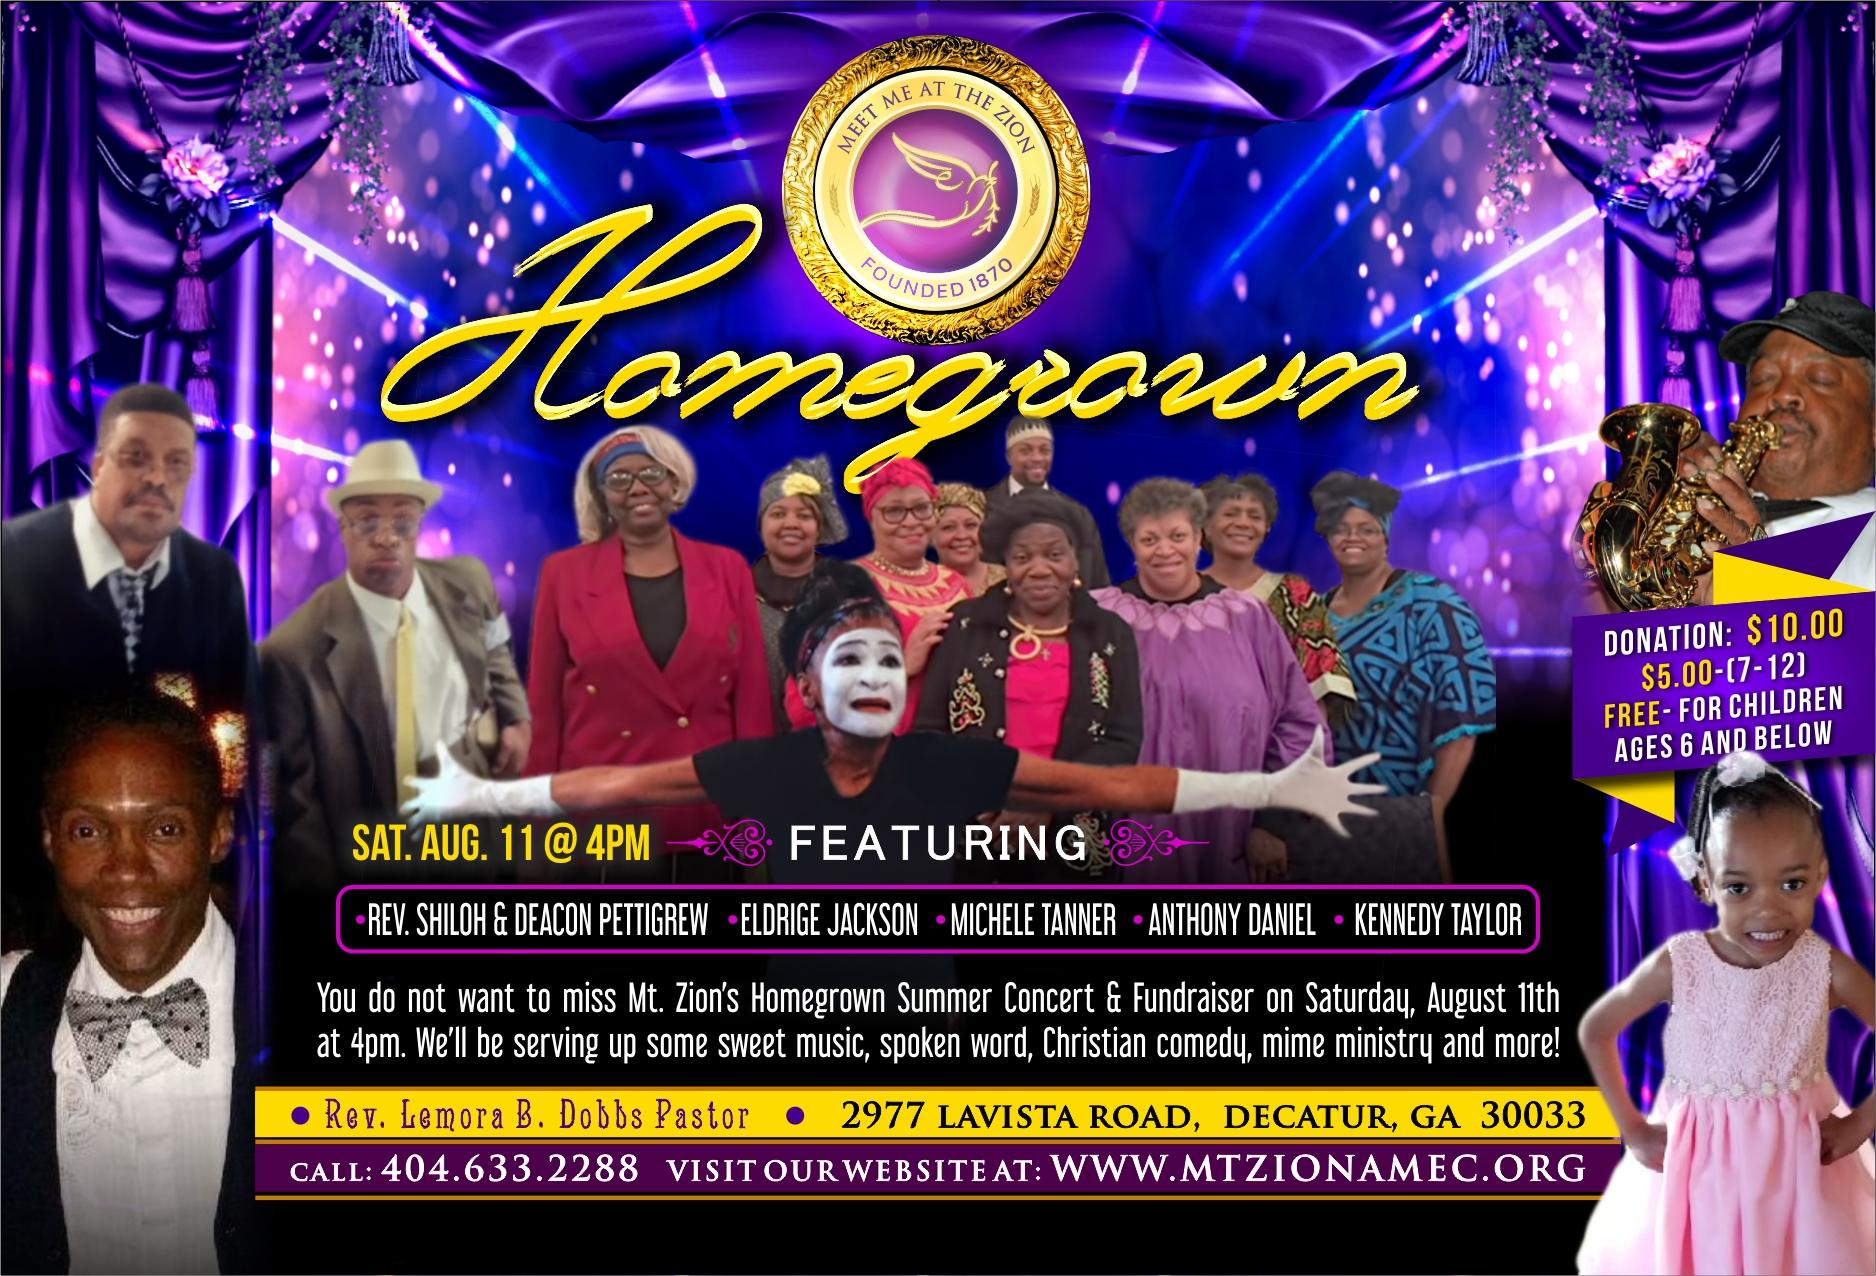 Mt. Zion Decatur 2018 Annual Homegrown Concert